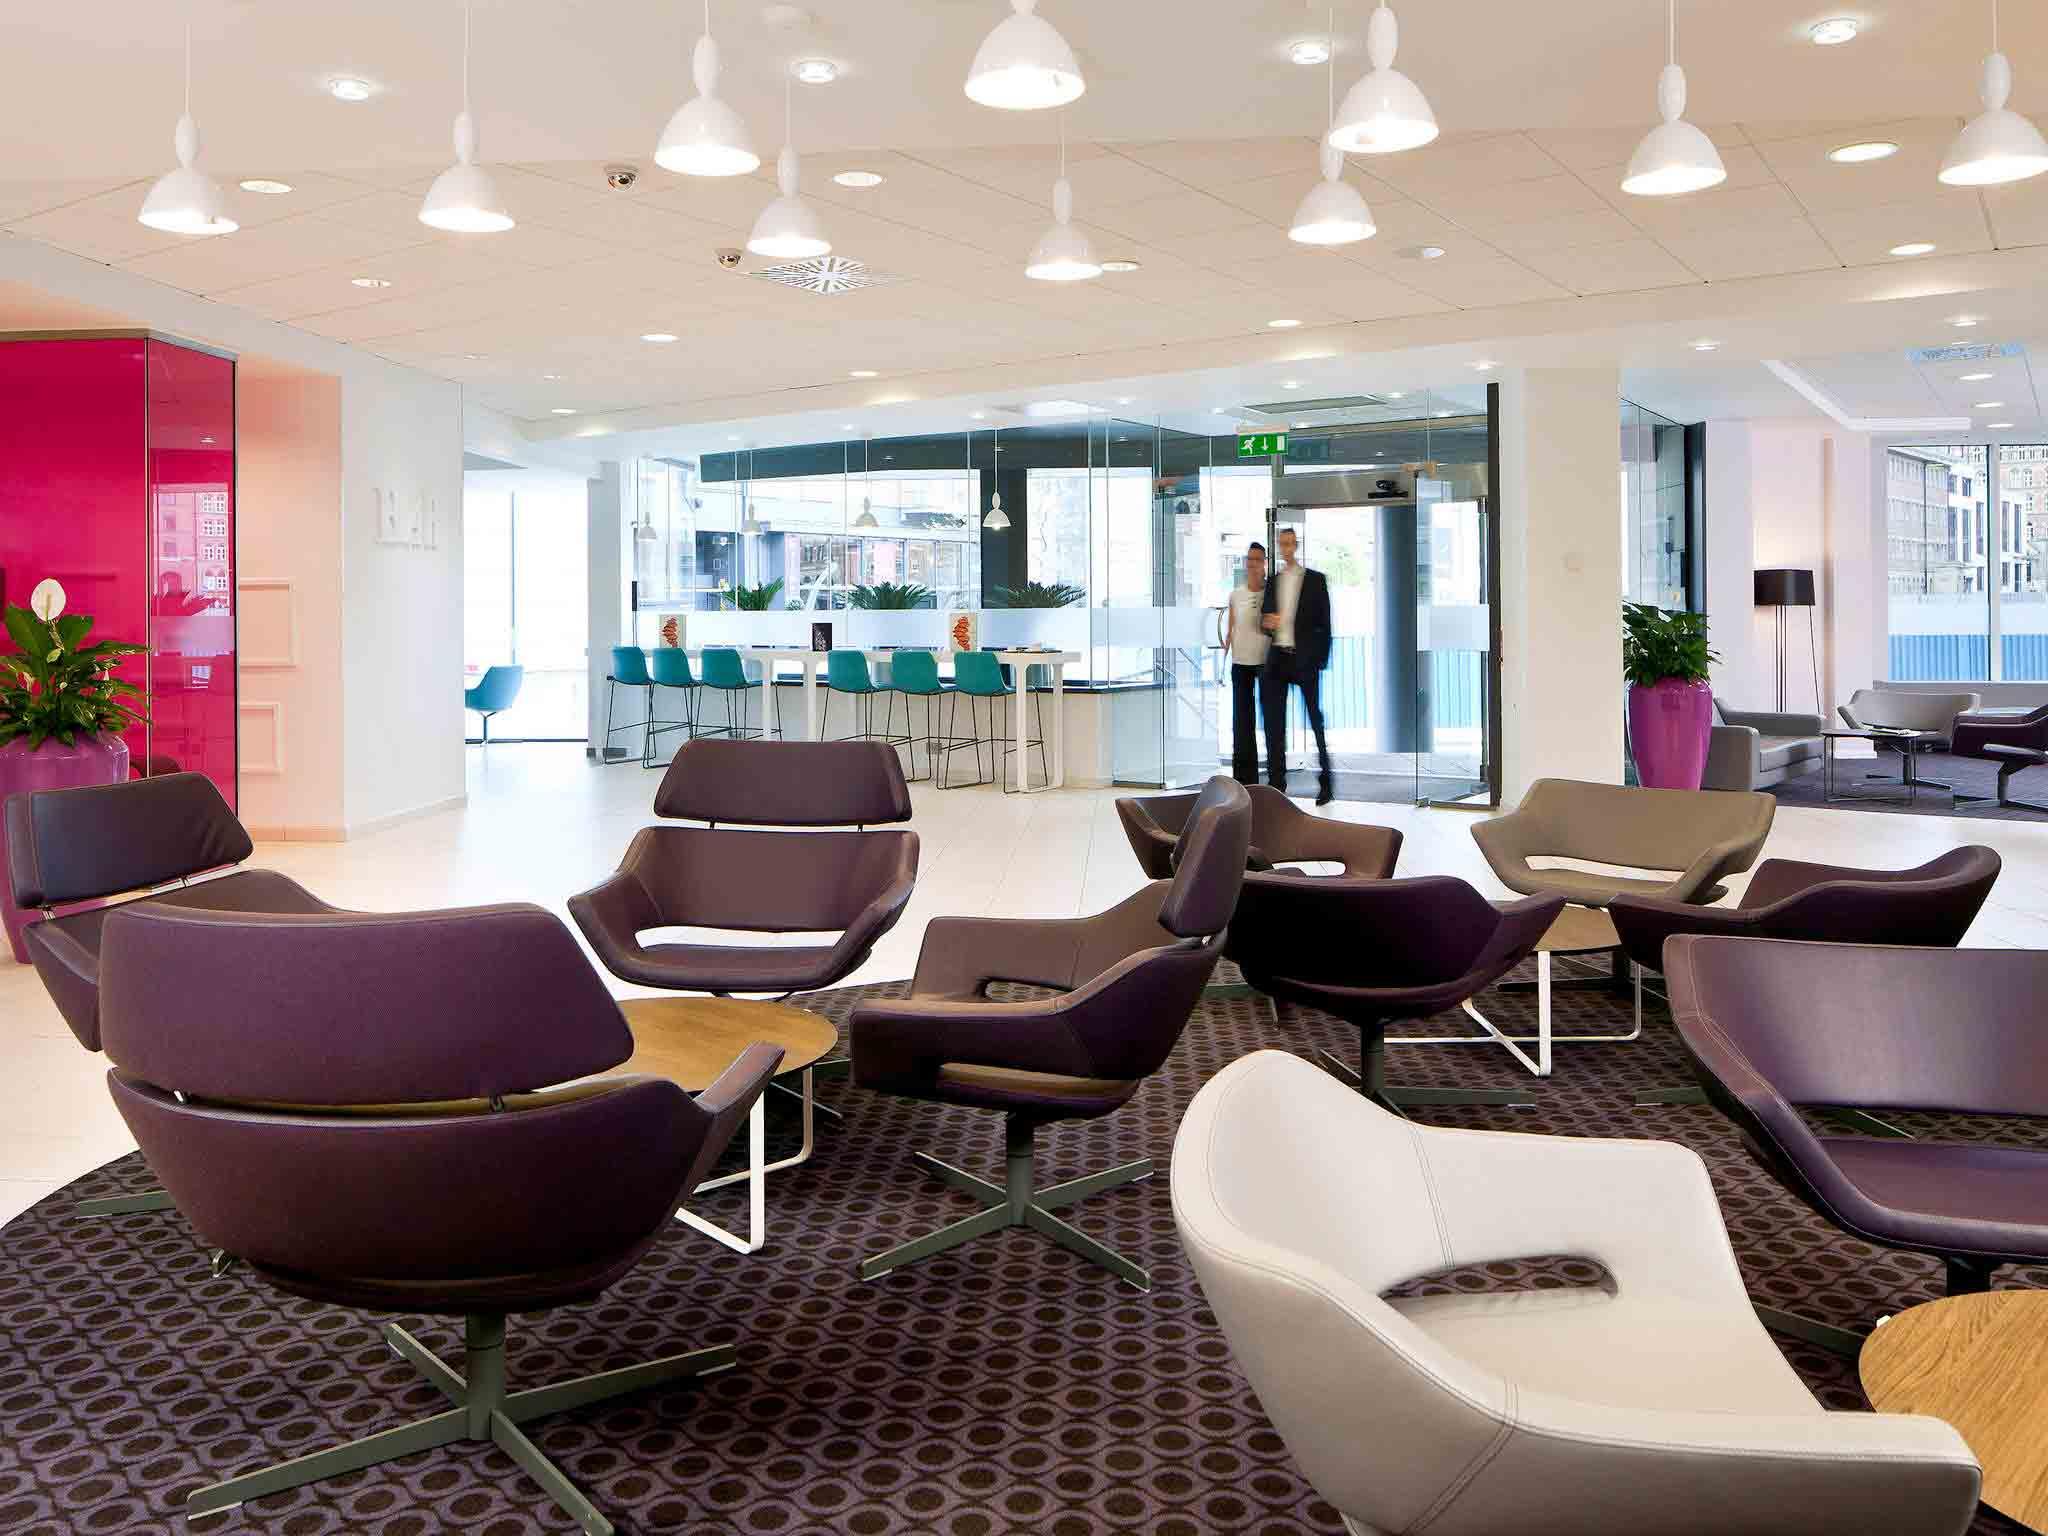 novotel leeds centre contemporary hotel in leeds